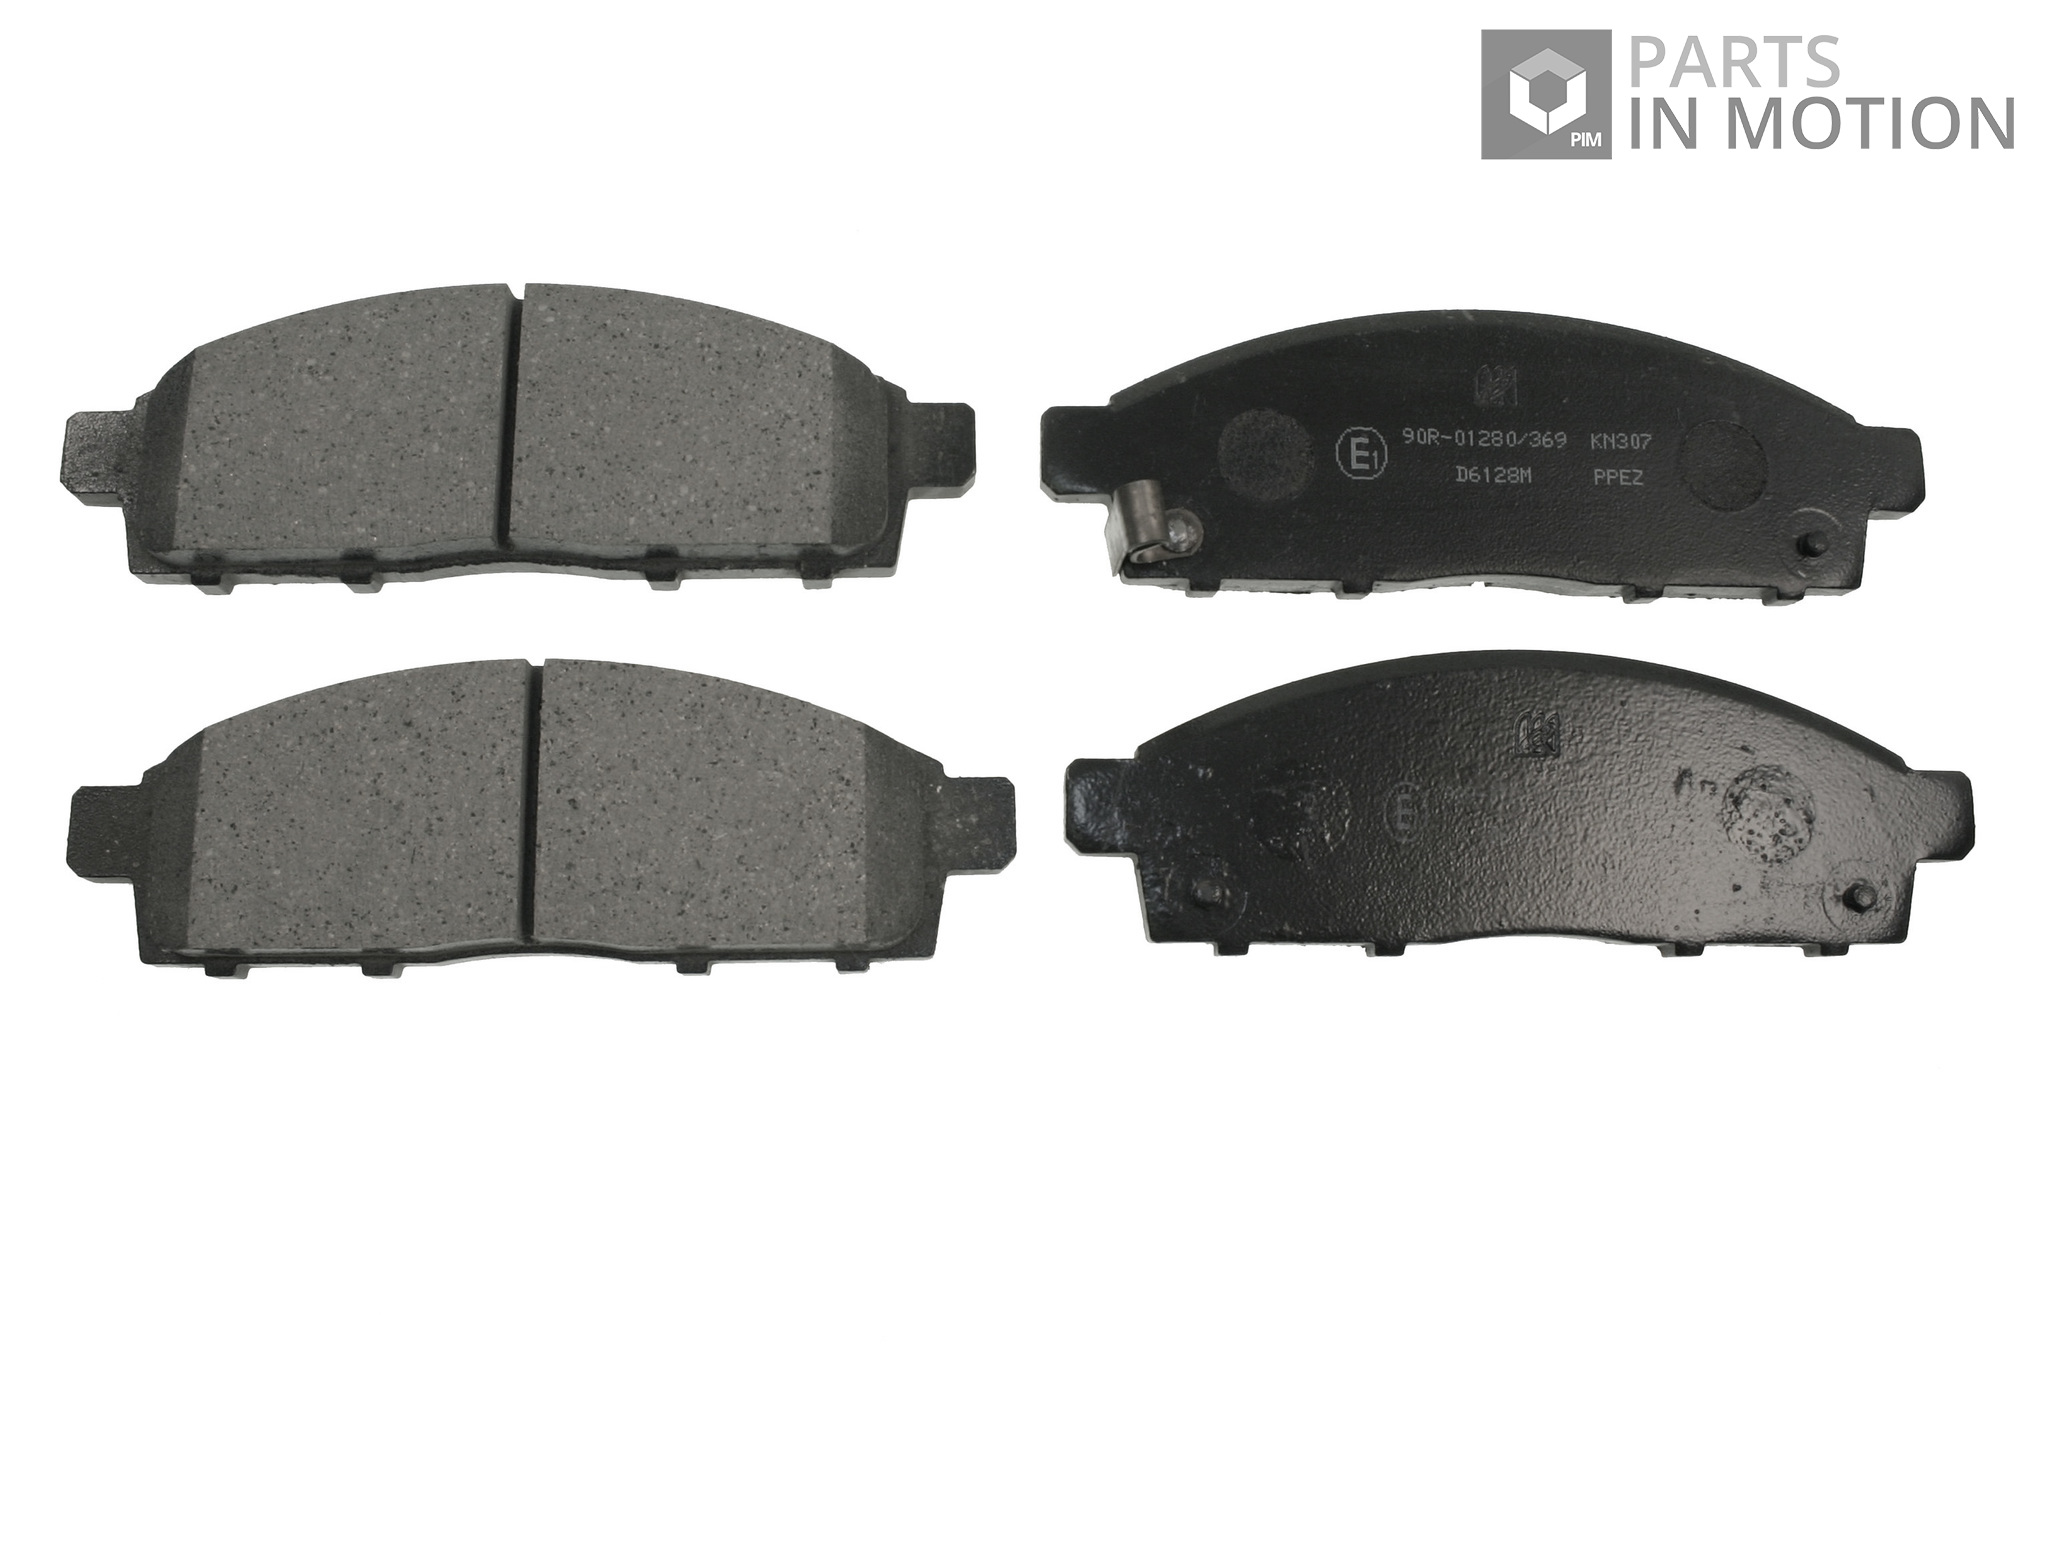 Fits Mitsubishi L200 2.5 DI-D EuroBrake Front Vented Brake Disc /& Pad Kit Set